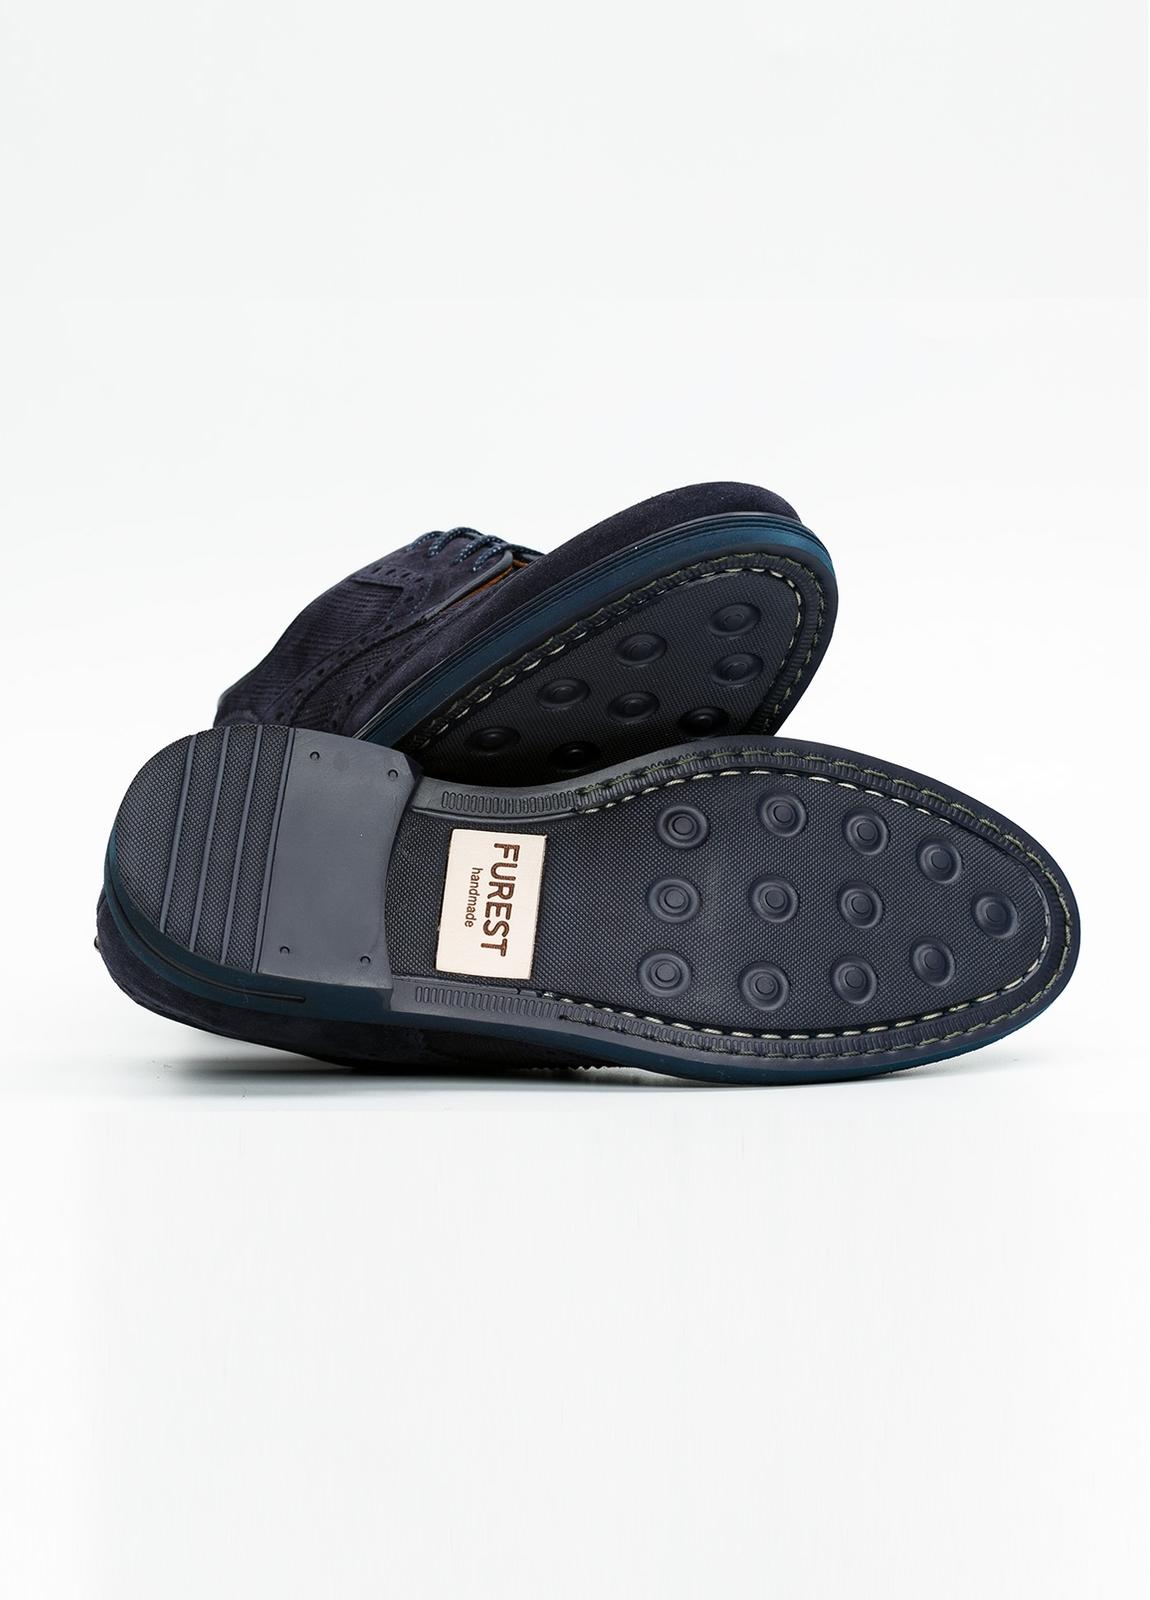 Zapato Formal Wear color azul marino. 100% Serraje. - Ítem1